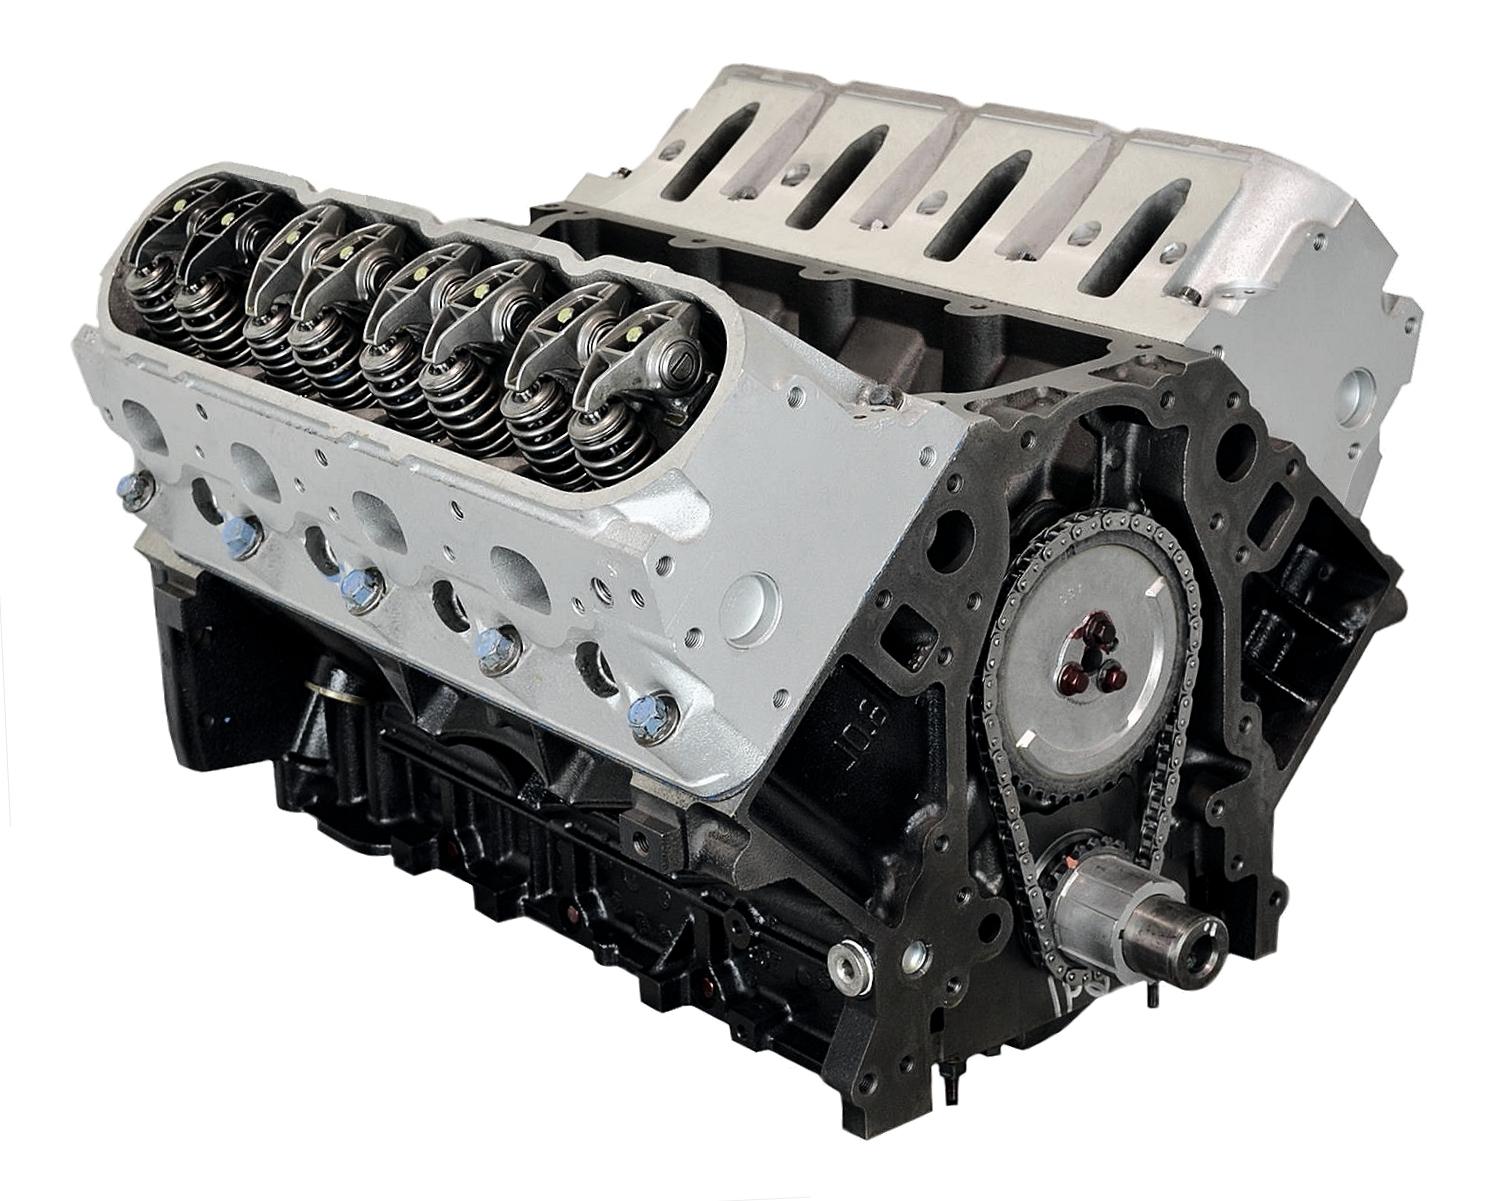 Chevrolet Silverado 1500 - 5.3 L59 Engine - 2002-2006 (Vin Code: Z)